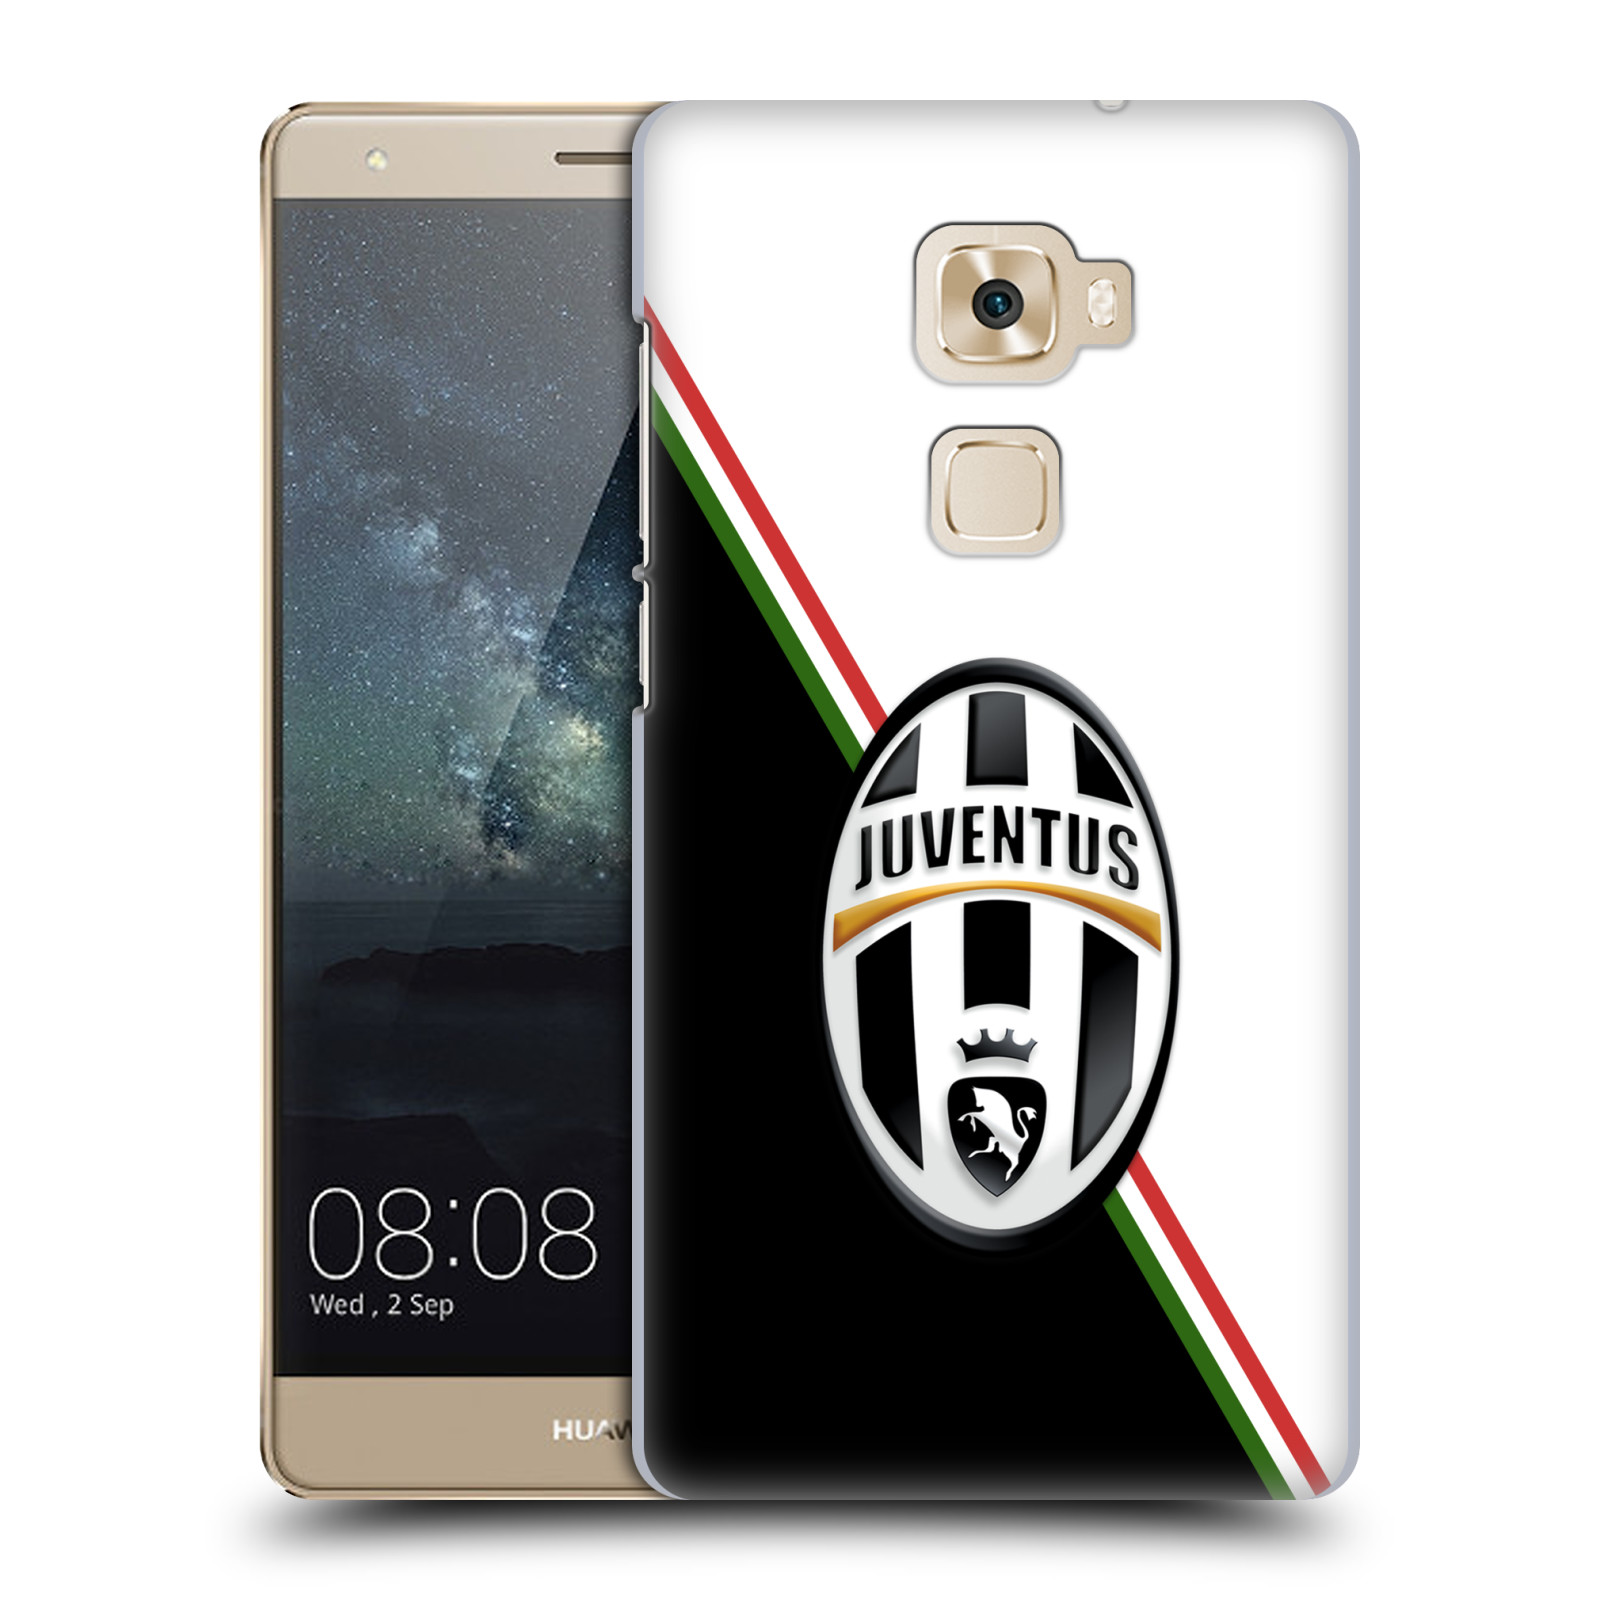 Plastové pouzdro na mobil Huawei Mate S HEAD CASE Juventus FC - Black and White (Plastový kryt či obal na mobilní telefon Juventus FC Official pro Huawei Mate S)